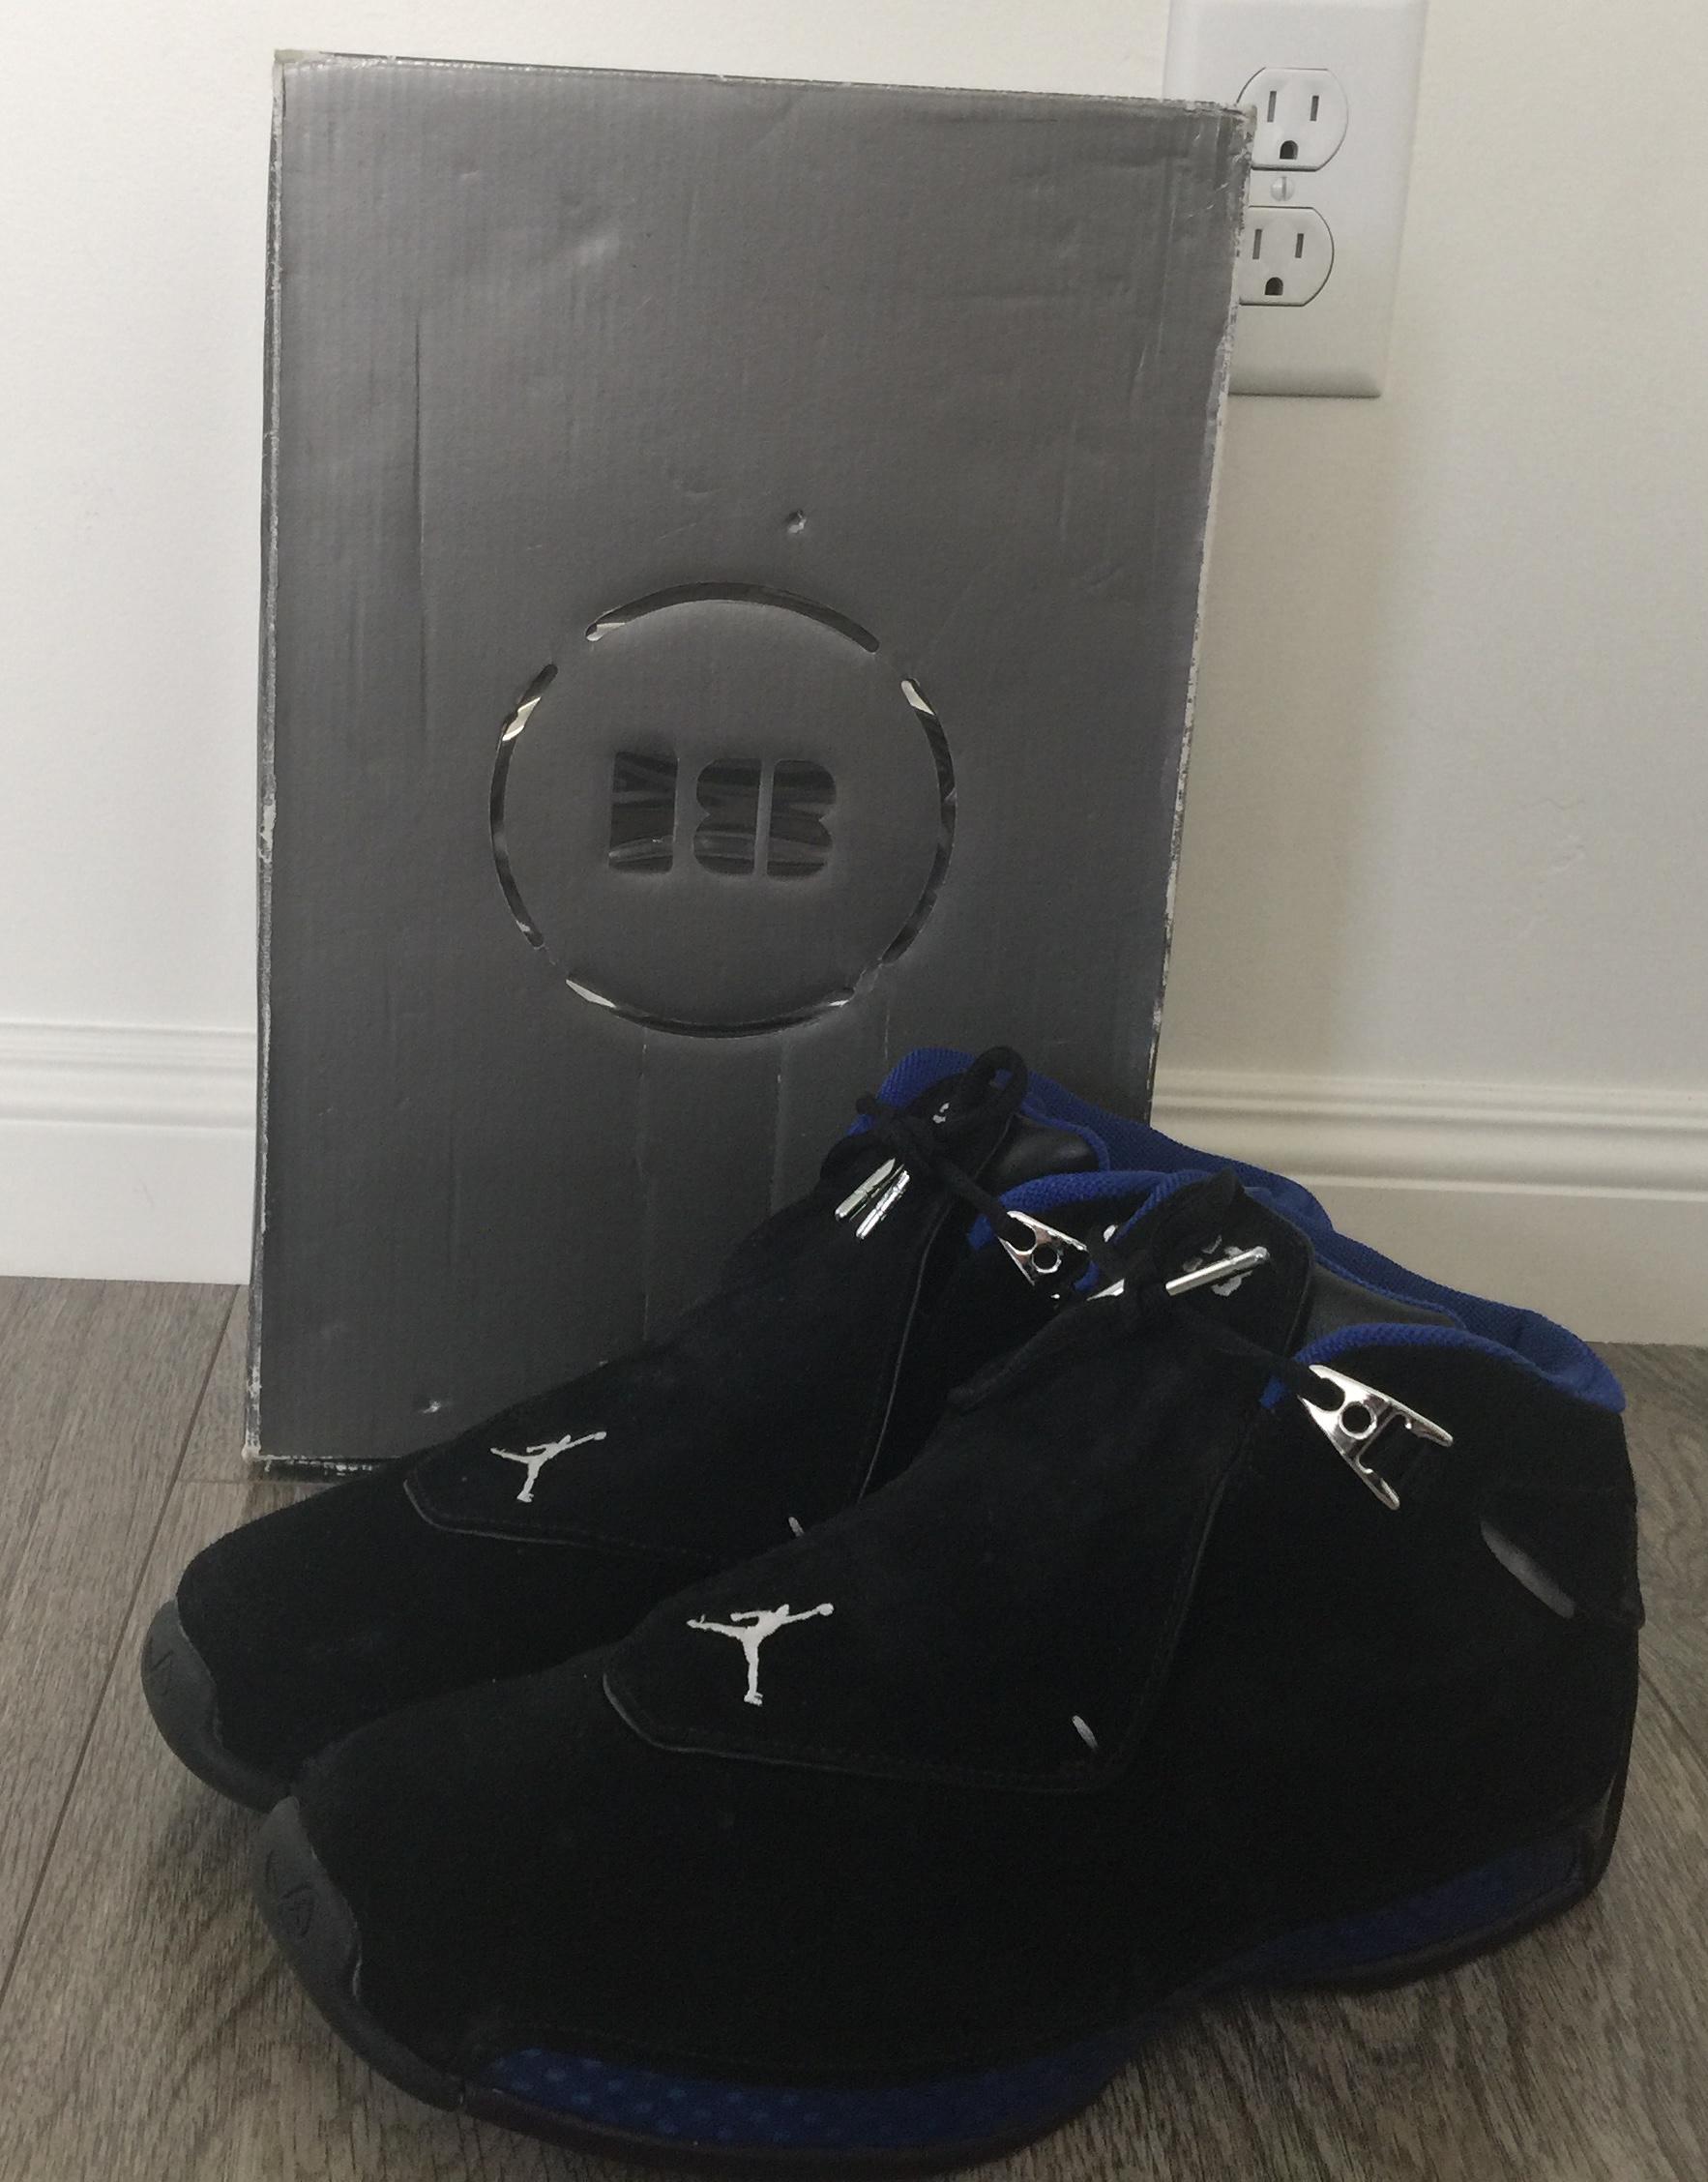 Air Jordan Collection: Retro & New Editions. Jordan.com